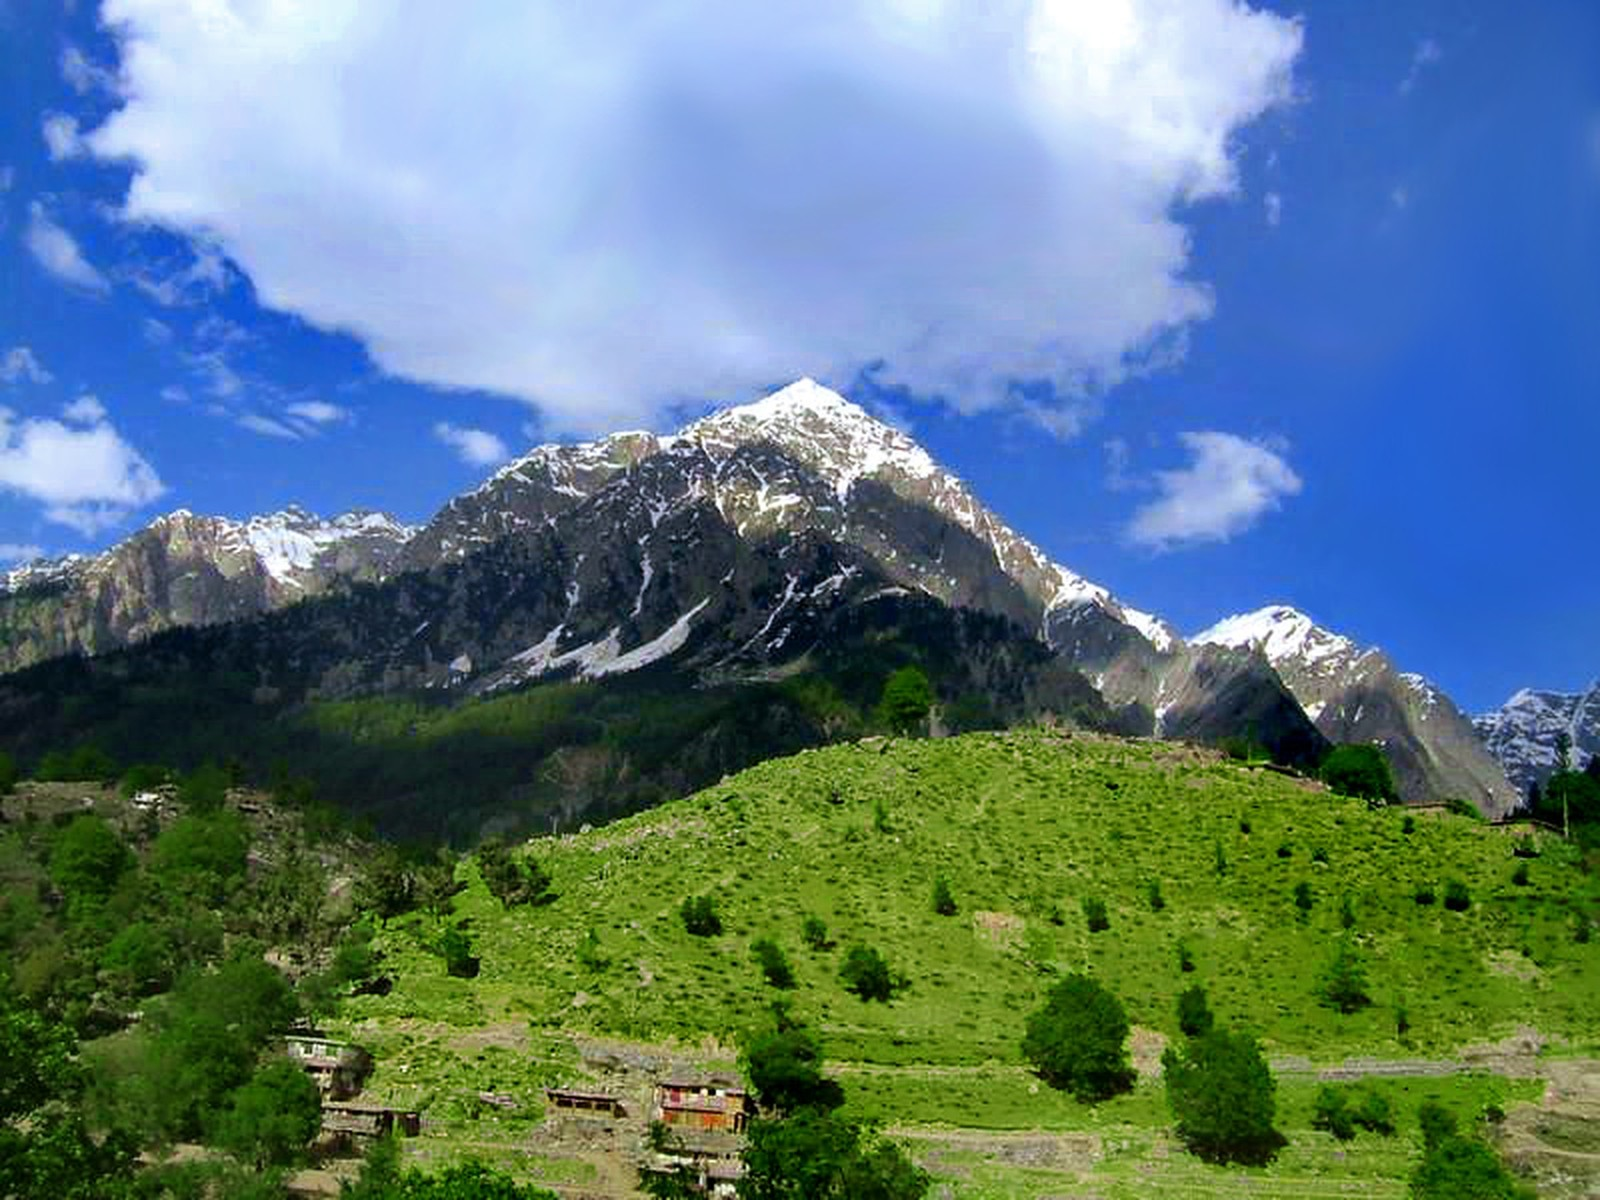 http://2.bp.blogspot.com/-FjMNtMku6y4/Tg__BgxYZxI/AAAAAAAAB5s/QegCvqdZ4gU/s1600/beautiful+Mountains.jpg